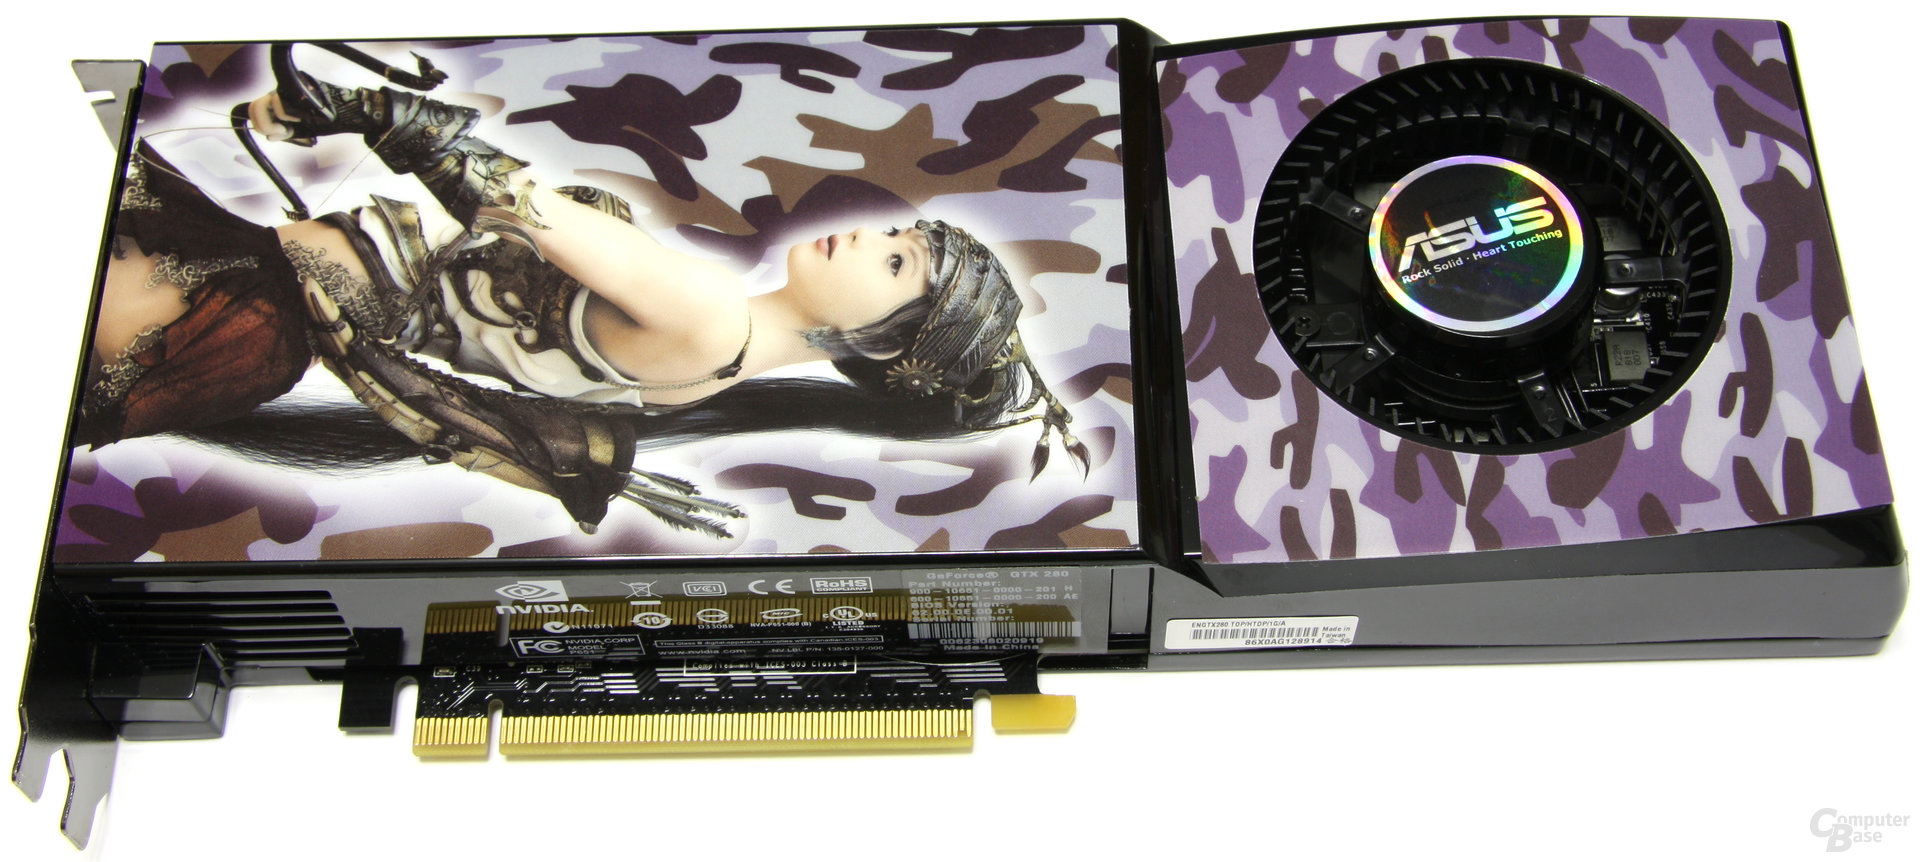 Asus GeForce GTX 280 GTX TOP